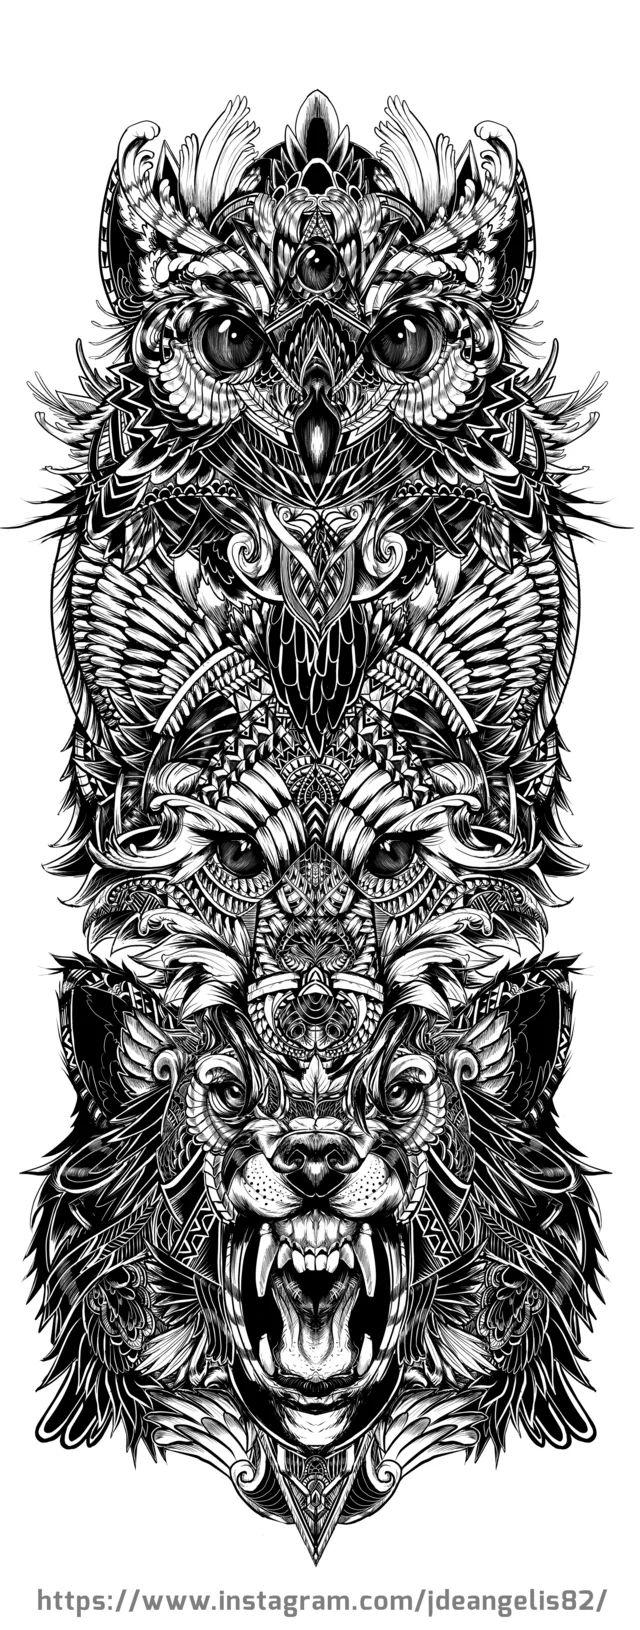 Animal totem - Imgur